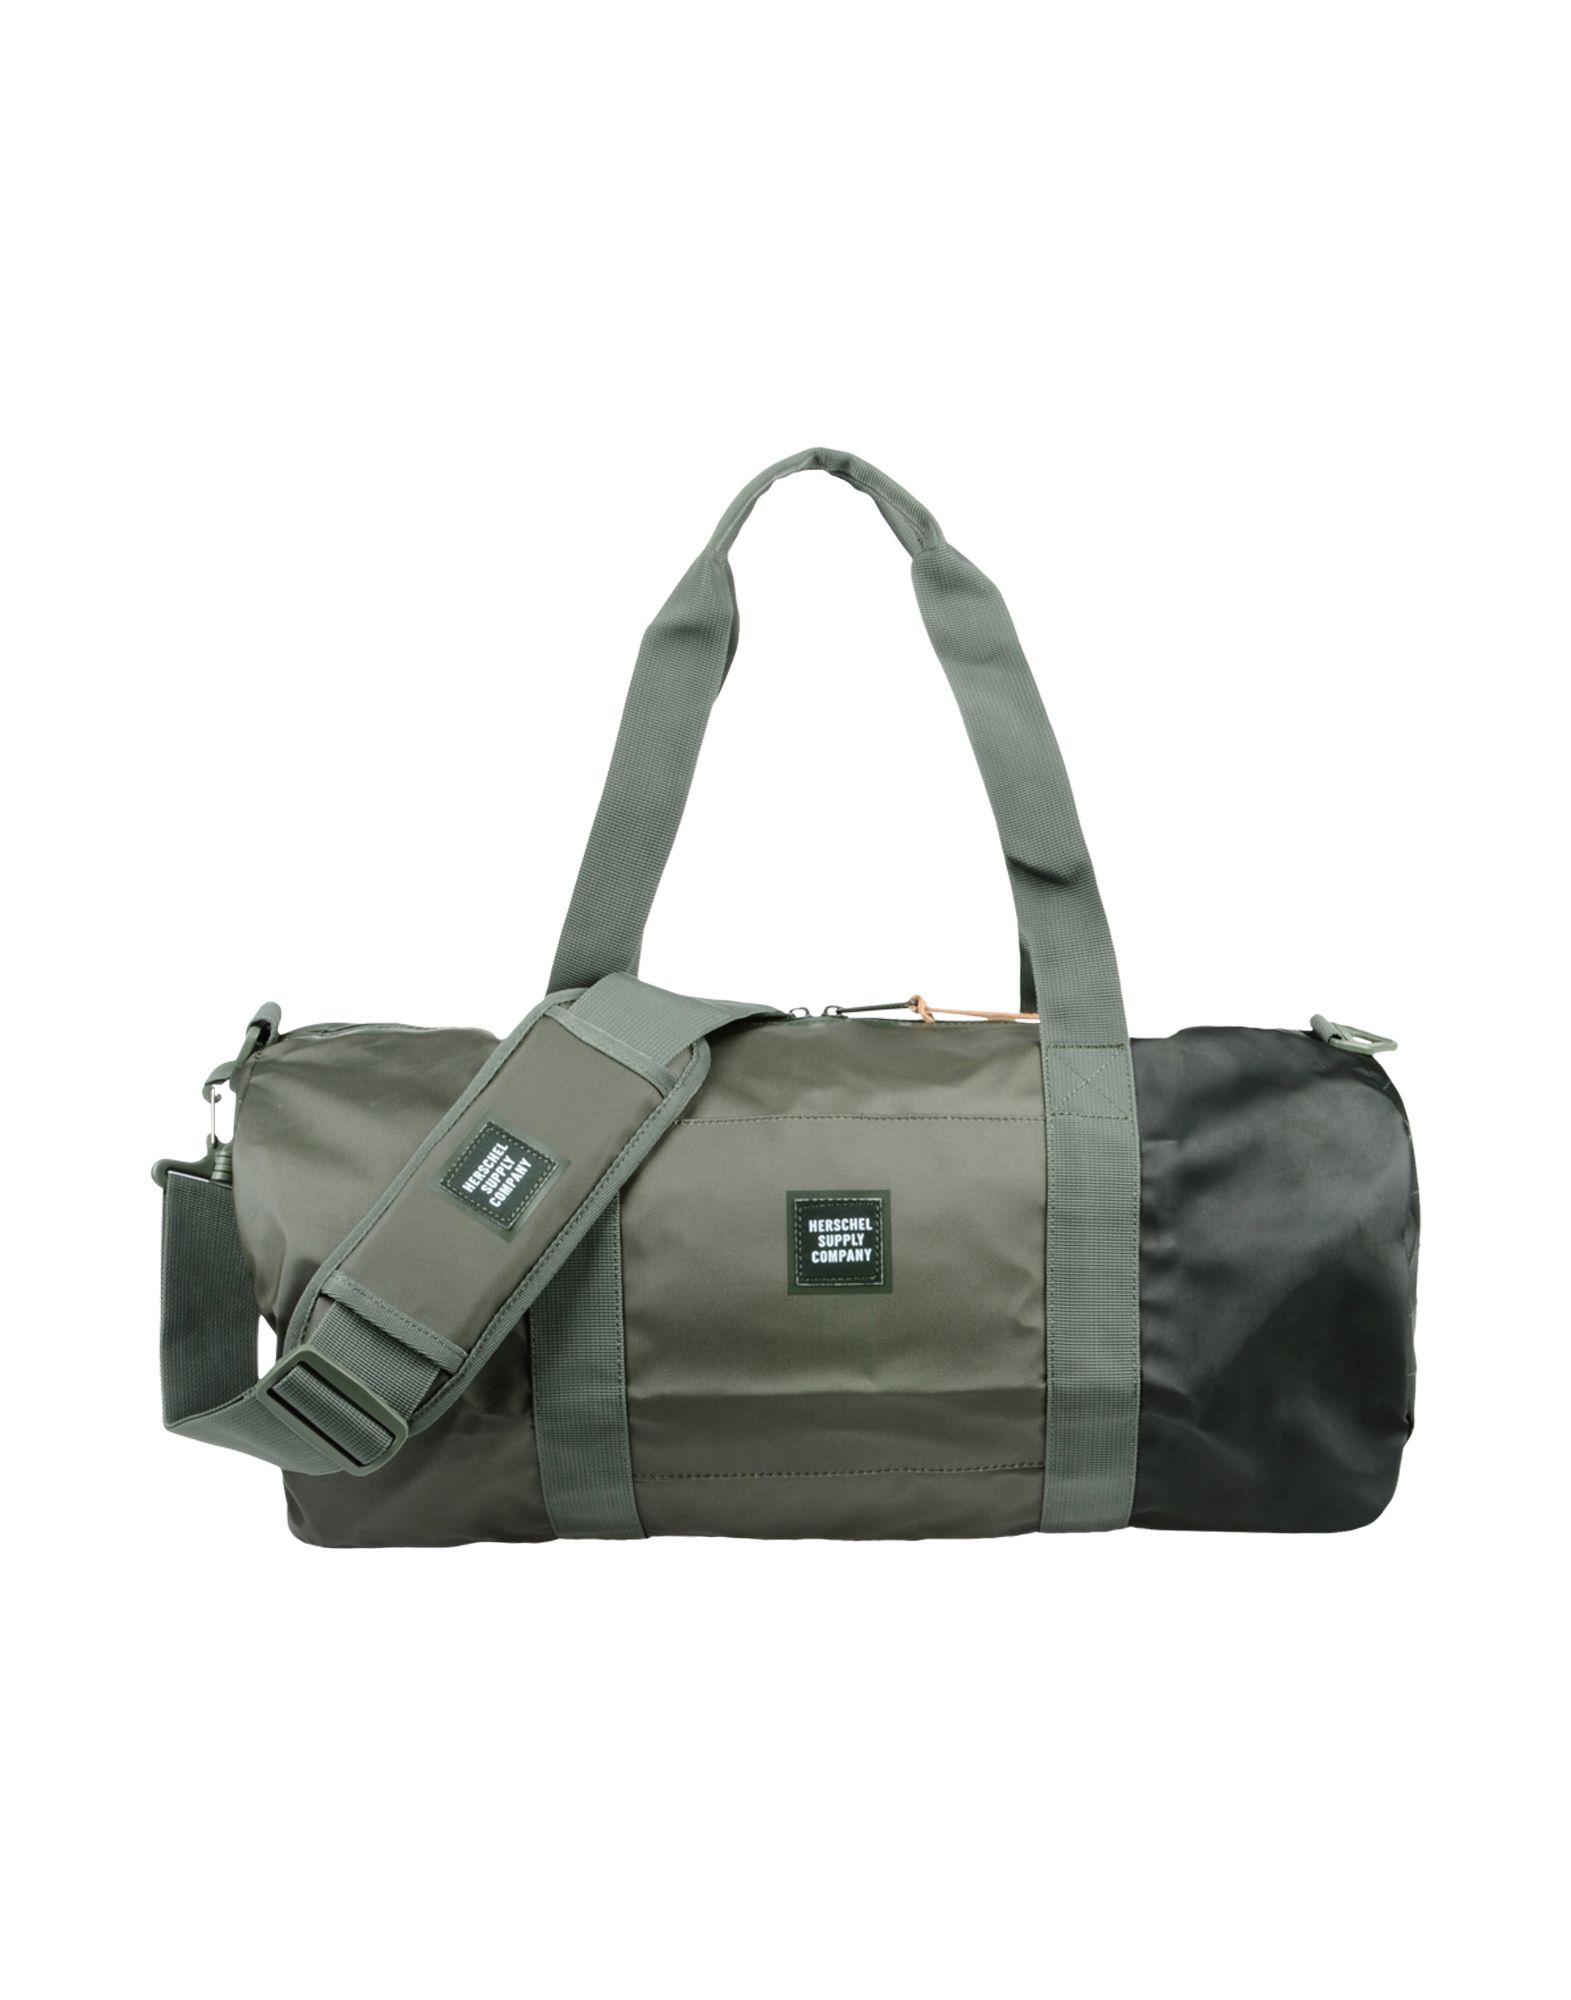 d0b88d2c6c4e Herschel Supply Co. Sutton Mid Duffle Studio - Travel   Duffel Bag ...